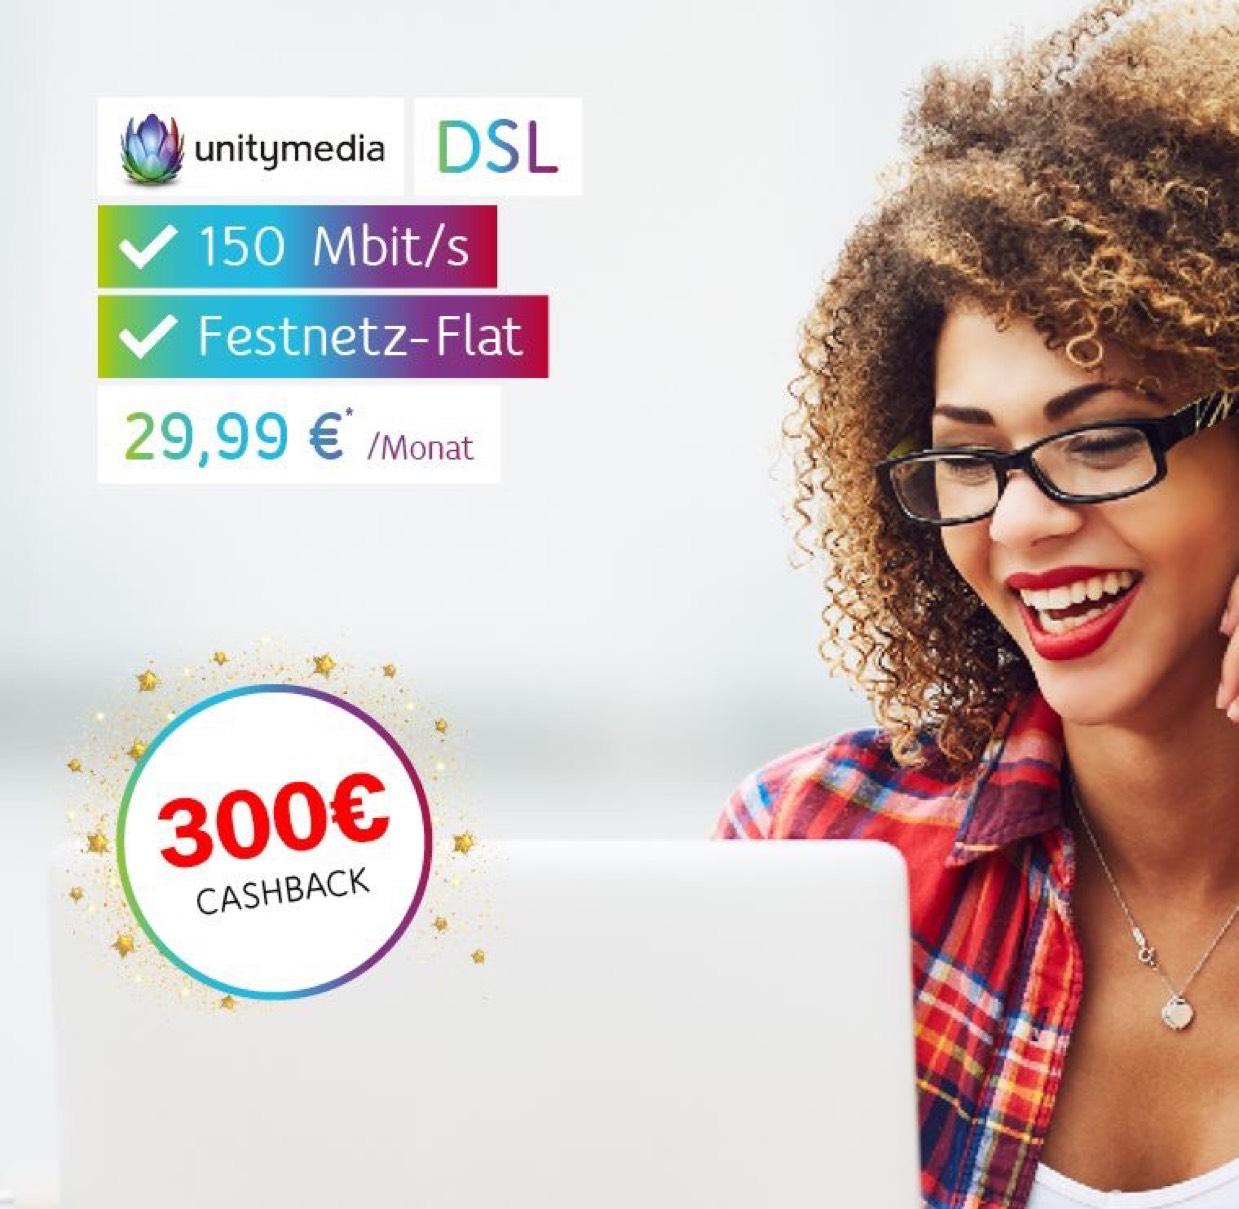 [Lokal] Unitymedia 2Play mit 300€ Cashback bei ibuy